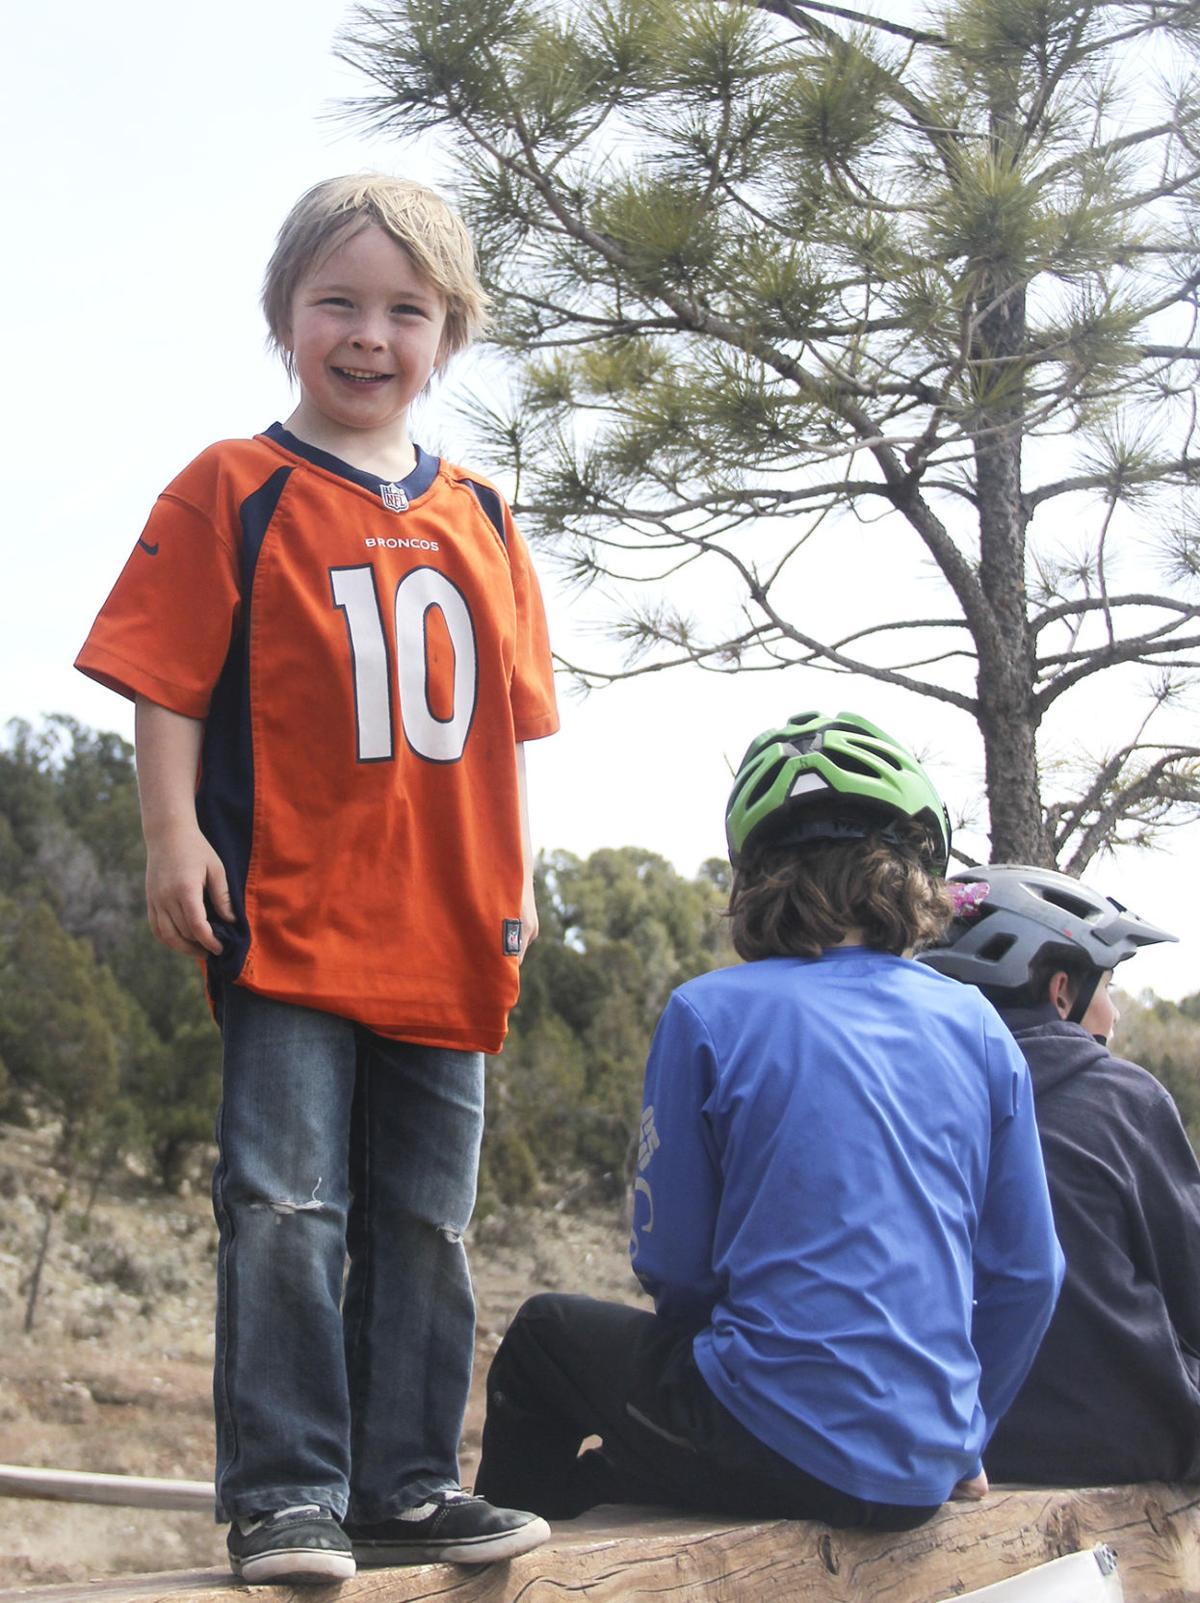 Broncos kid bikepark jb photo_8624.jpg